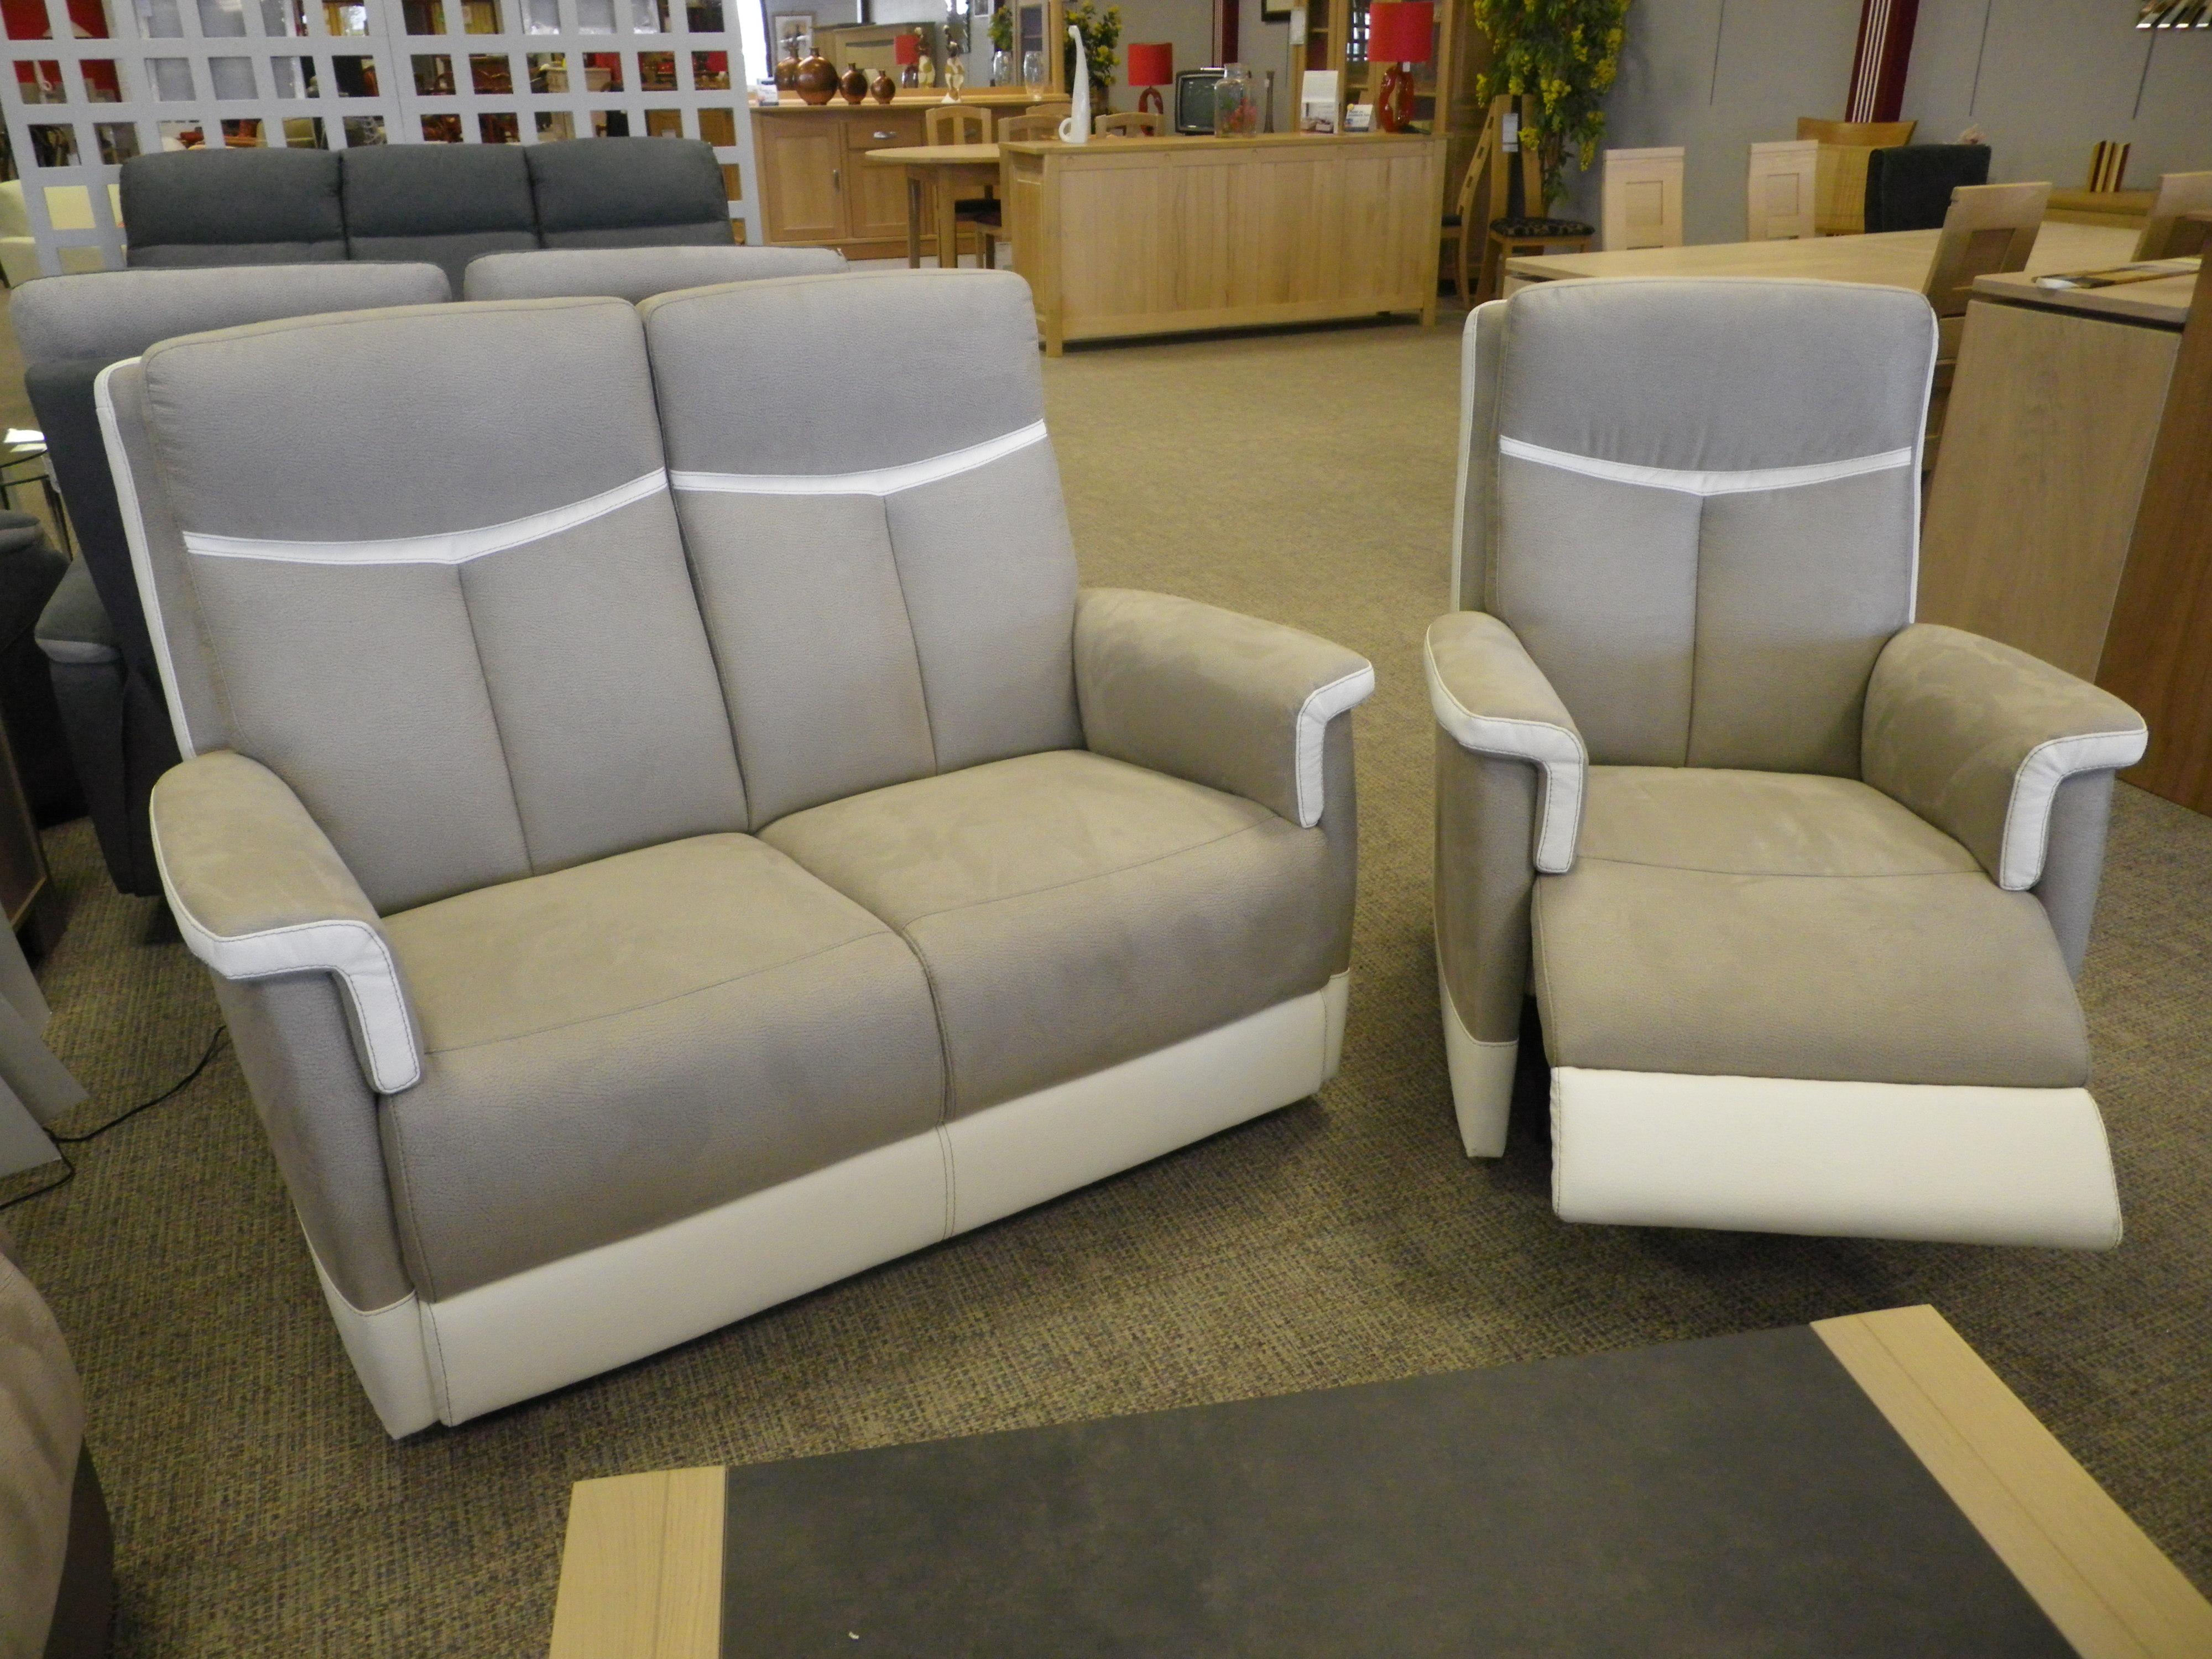 magasin meuble laval 53 great magasin de meubles with magasin meuble laval 53 good meubles. Black Bedroom Furniture Sets. Home Design Ideas